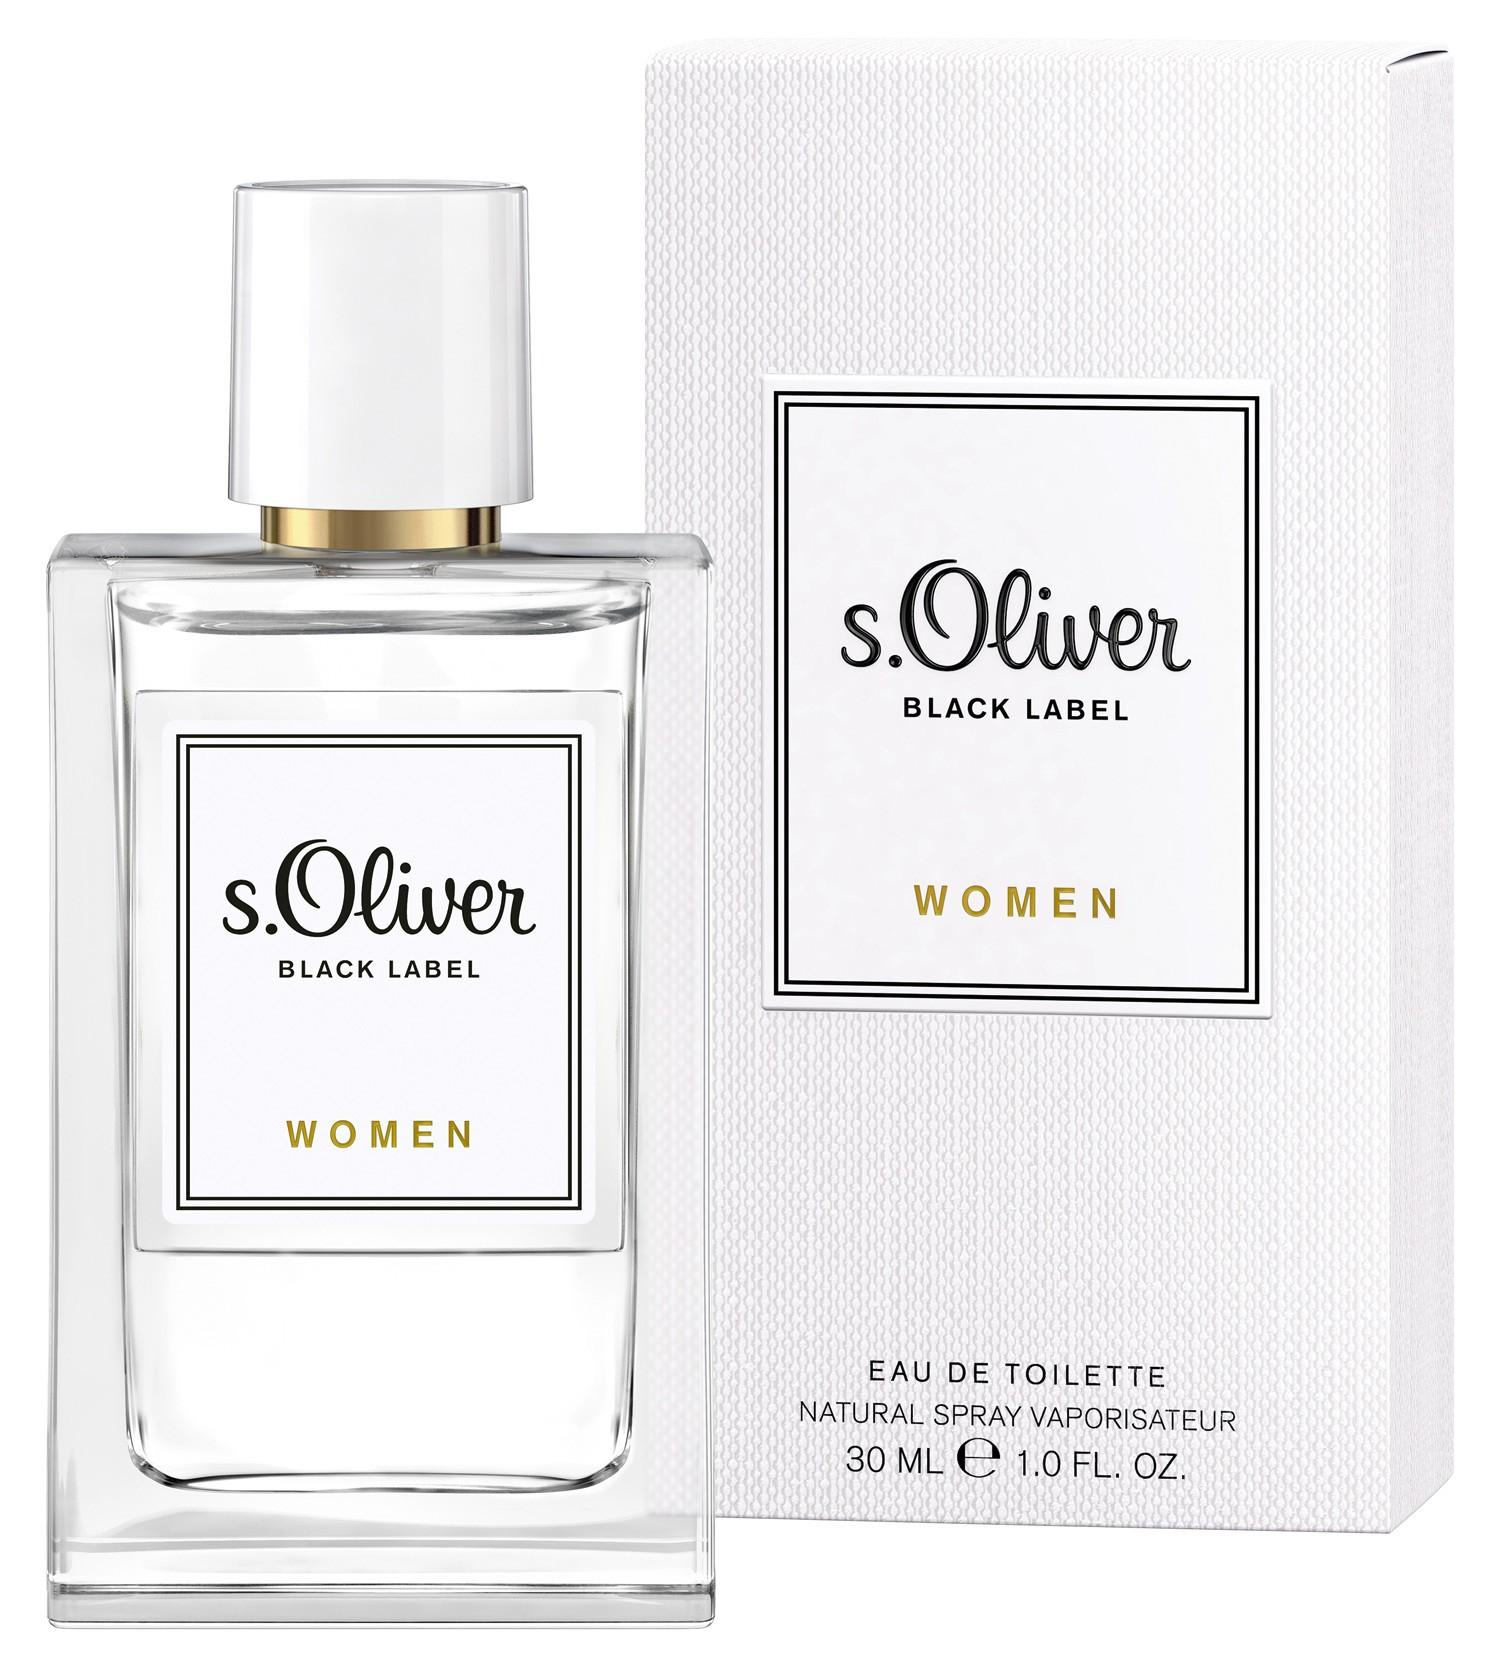 s.Oliver Black Label Women аромат для женщин